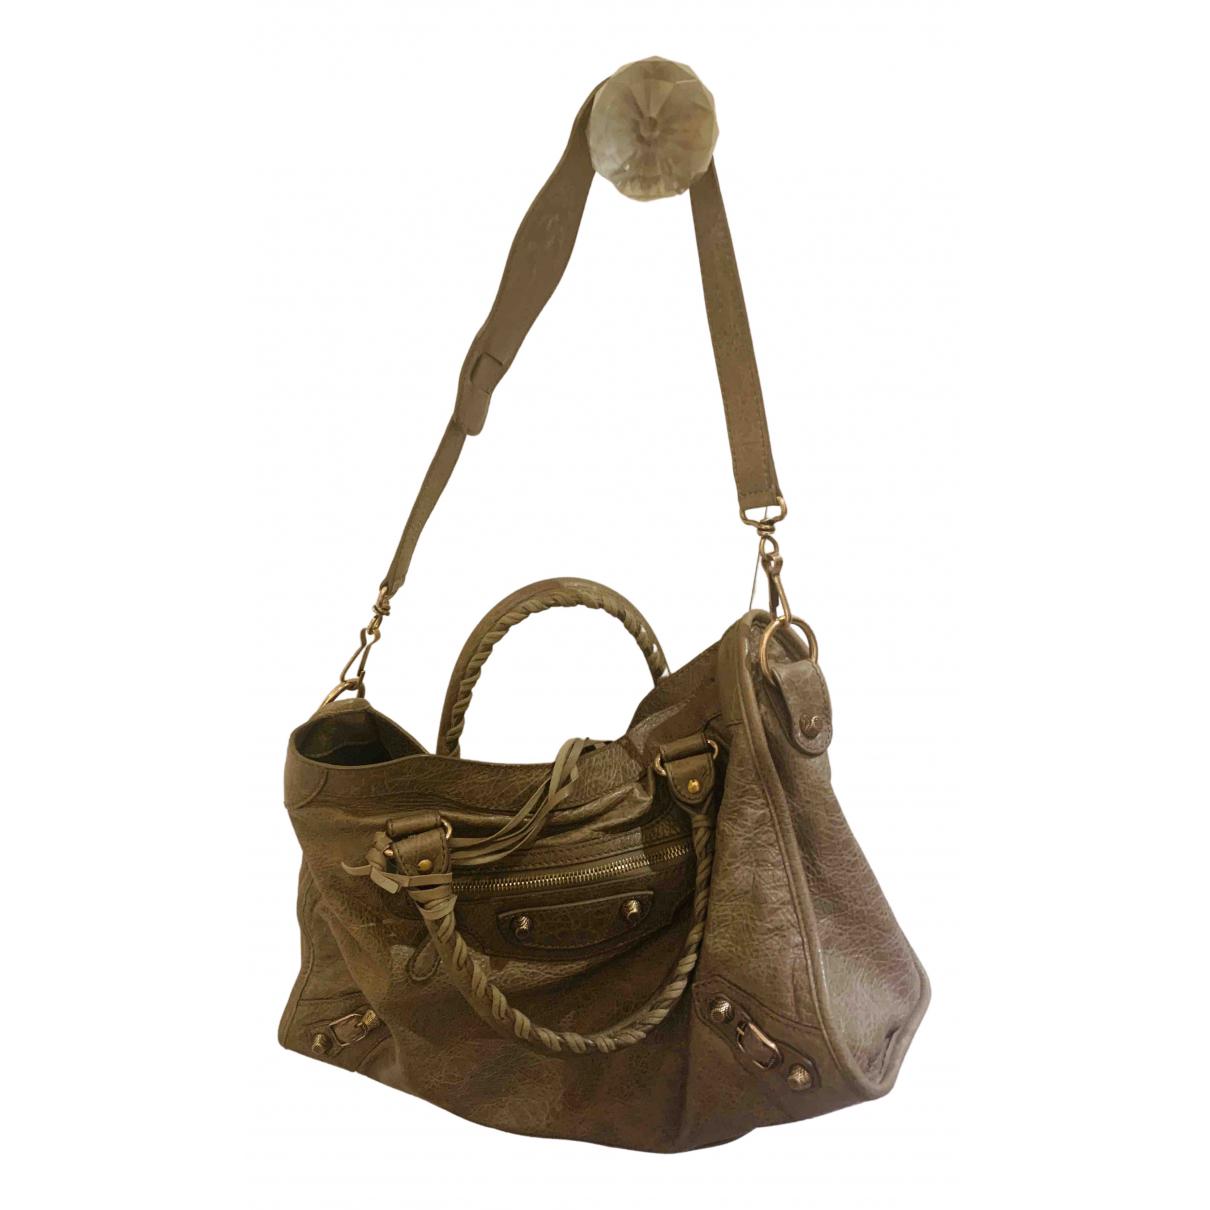 Balenciaga City Handtasche in  Beige Leder